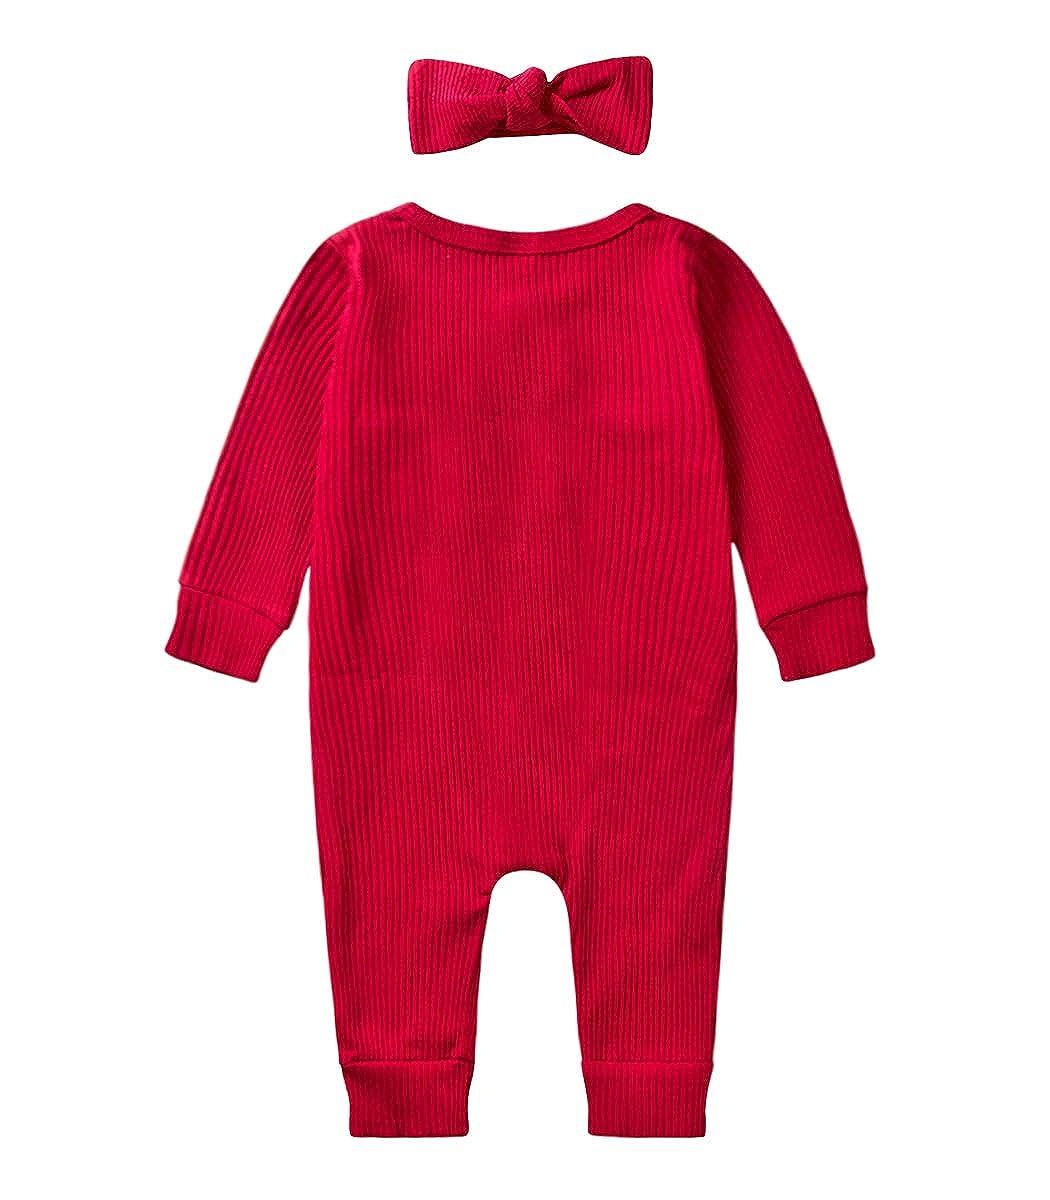 MetCuento Newborn Baby Girls Romper Headband Solid Color Cotton One Piece Pajamas Sleeper 0-18 Months